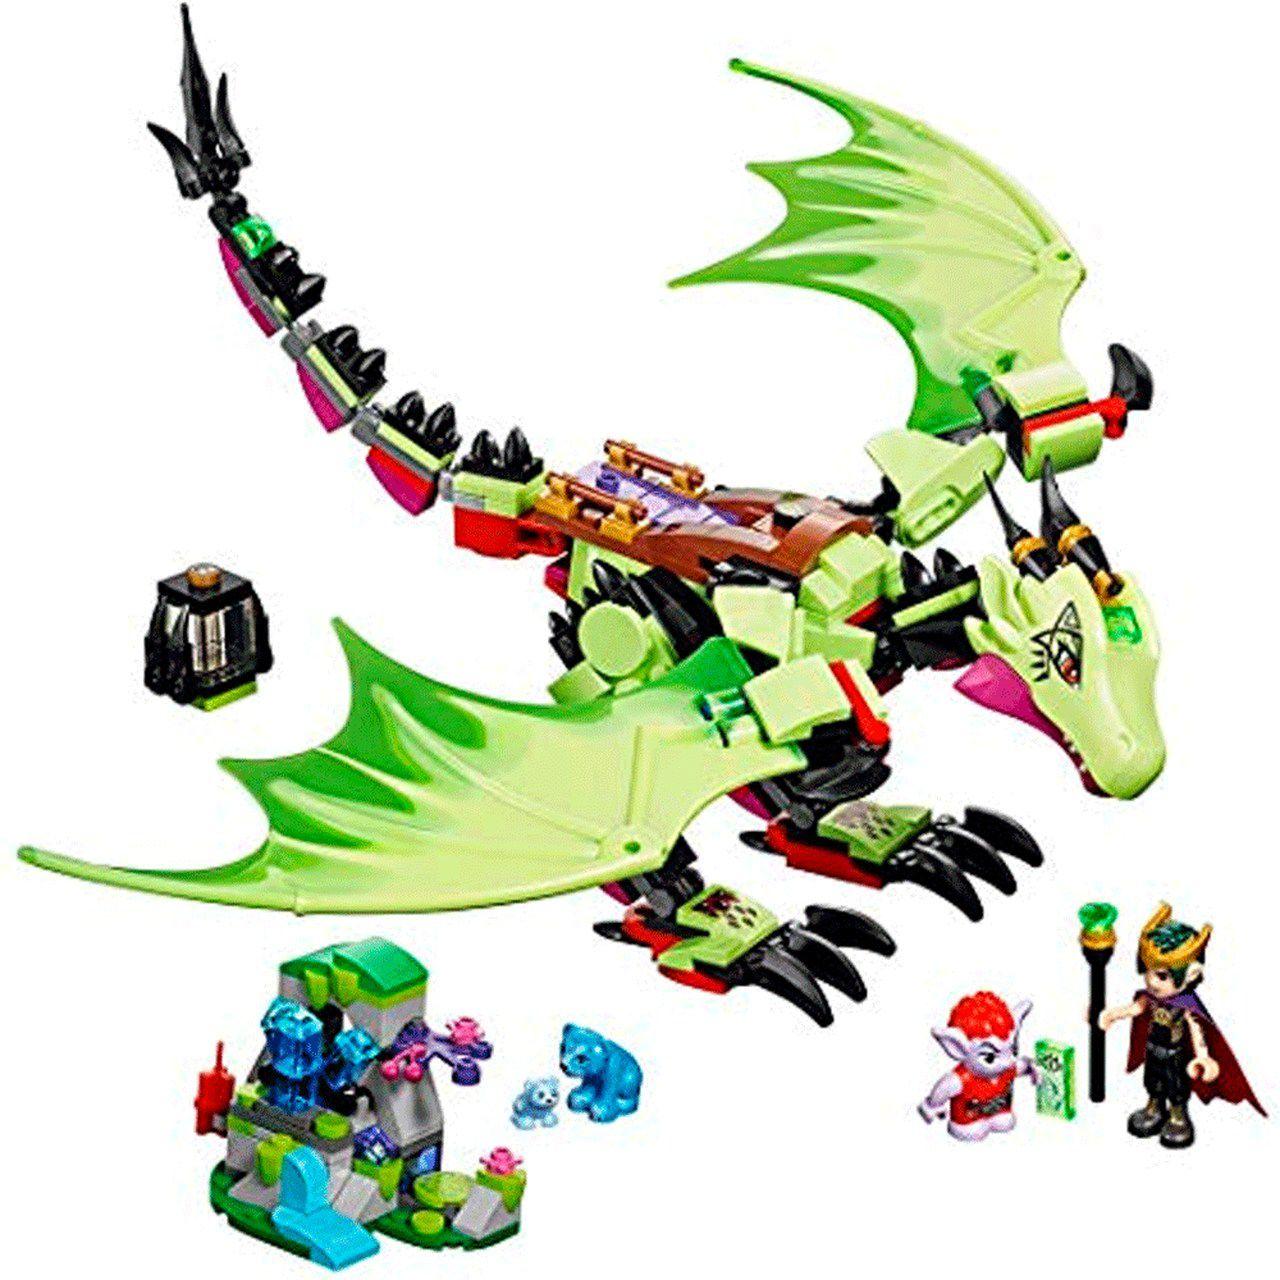 LEGO The Globin King's Evil Dragon: Disney - (695 peças) (Apenas Venda Online)